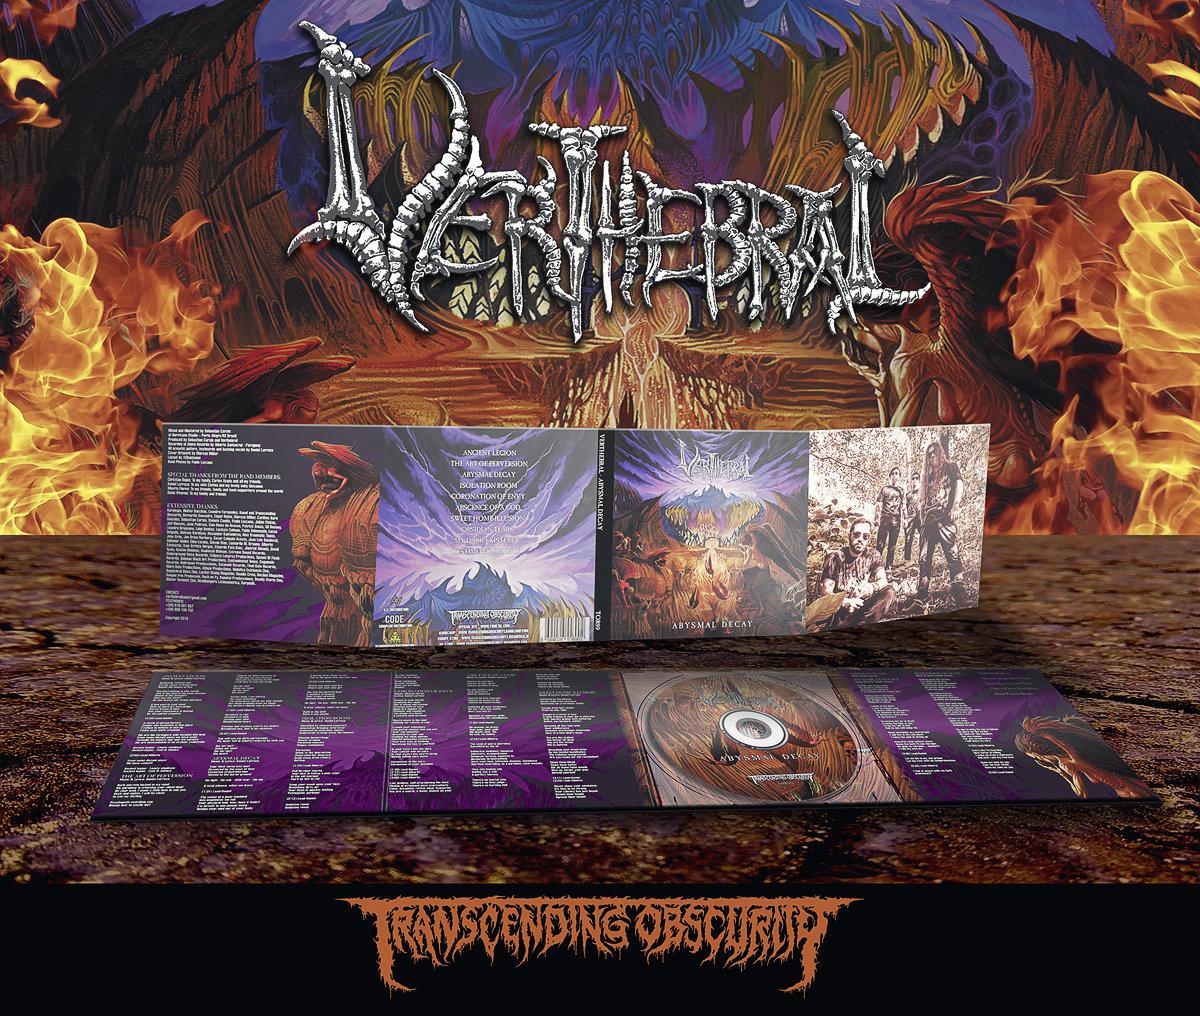 VERTHEBRAL (Paraguay) - Abysmal Decay Digipak CD